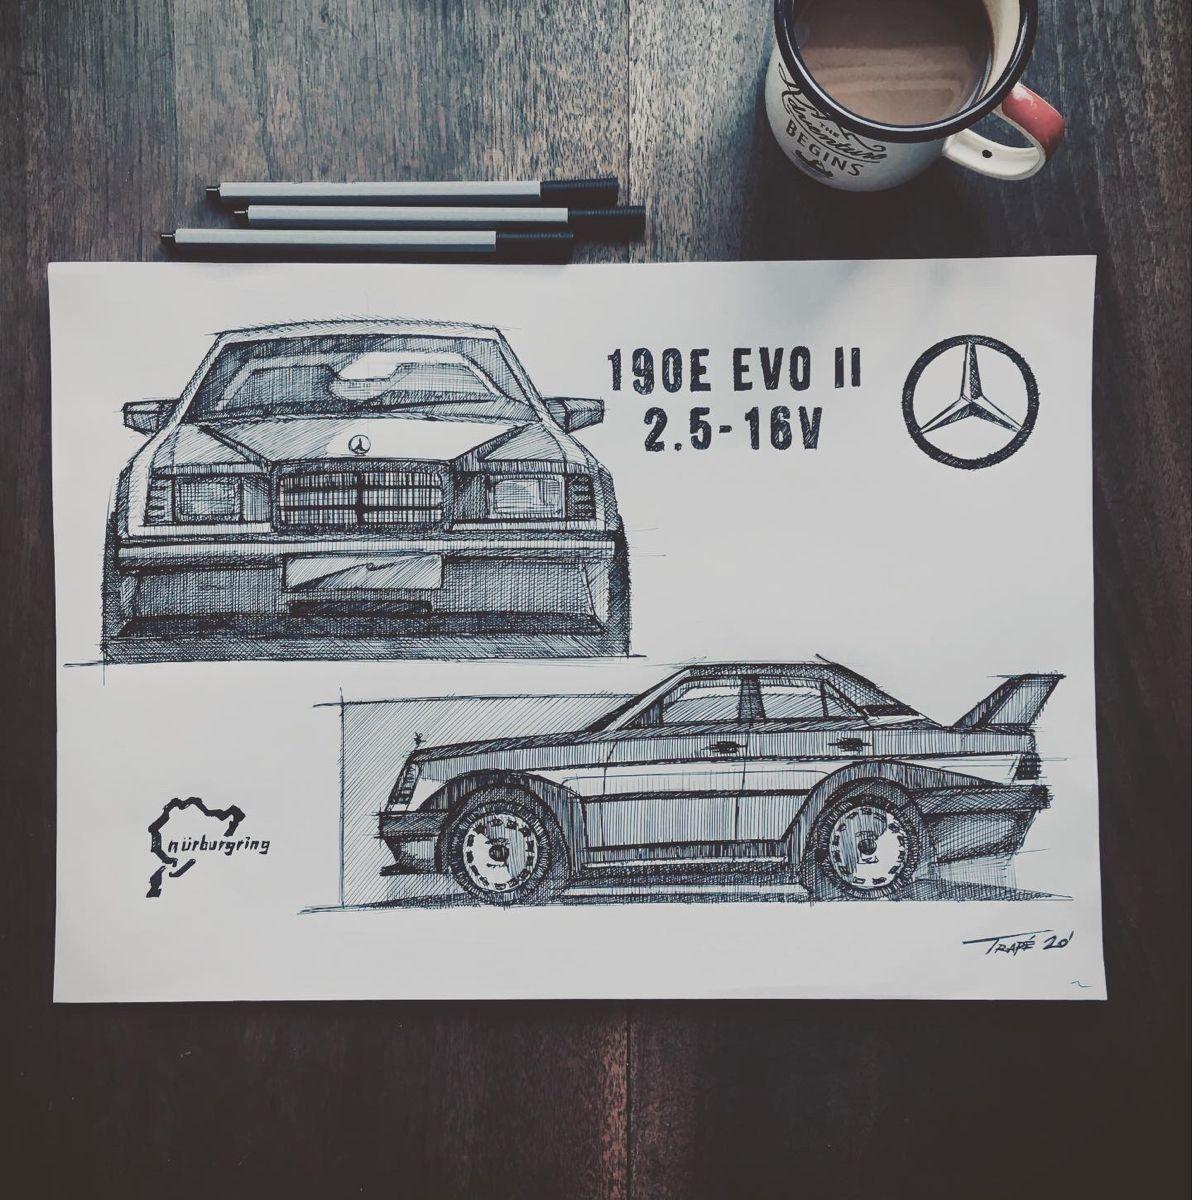 #mercedesbenz #mercedes #190e #190evolution #190evo2 #classiccars #youngtimer #savethemanuals #coolandvintage #petrolheadsketching #germancar #racing #dtm #tourism #nürburgring #coolcar #stuttgart #porsche #alfaromeo #amg #cardesign #cardesignmedia #cardesignnews #e30 #m3 #bmw #automotive #cardesigner